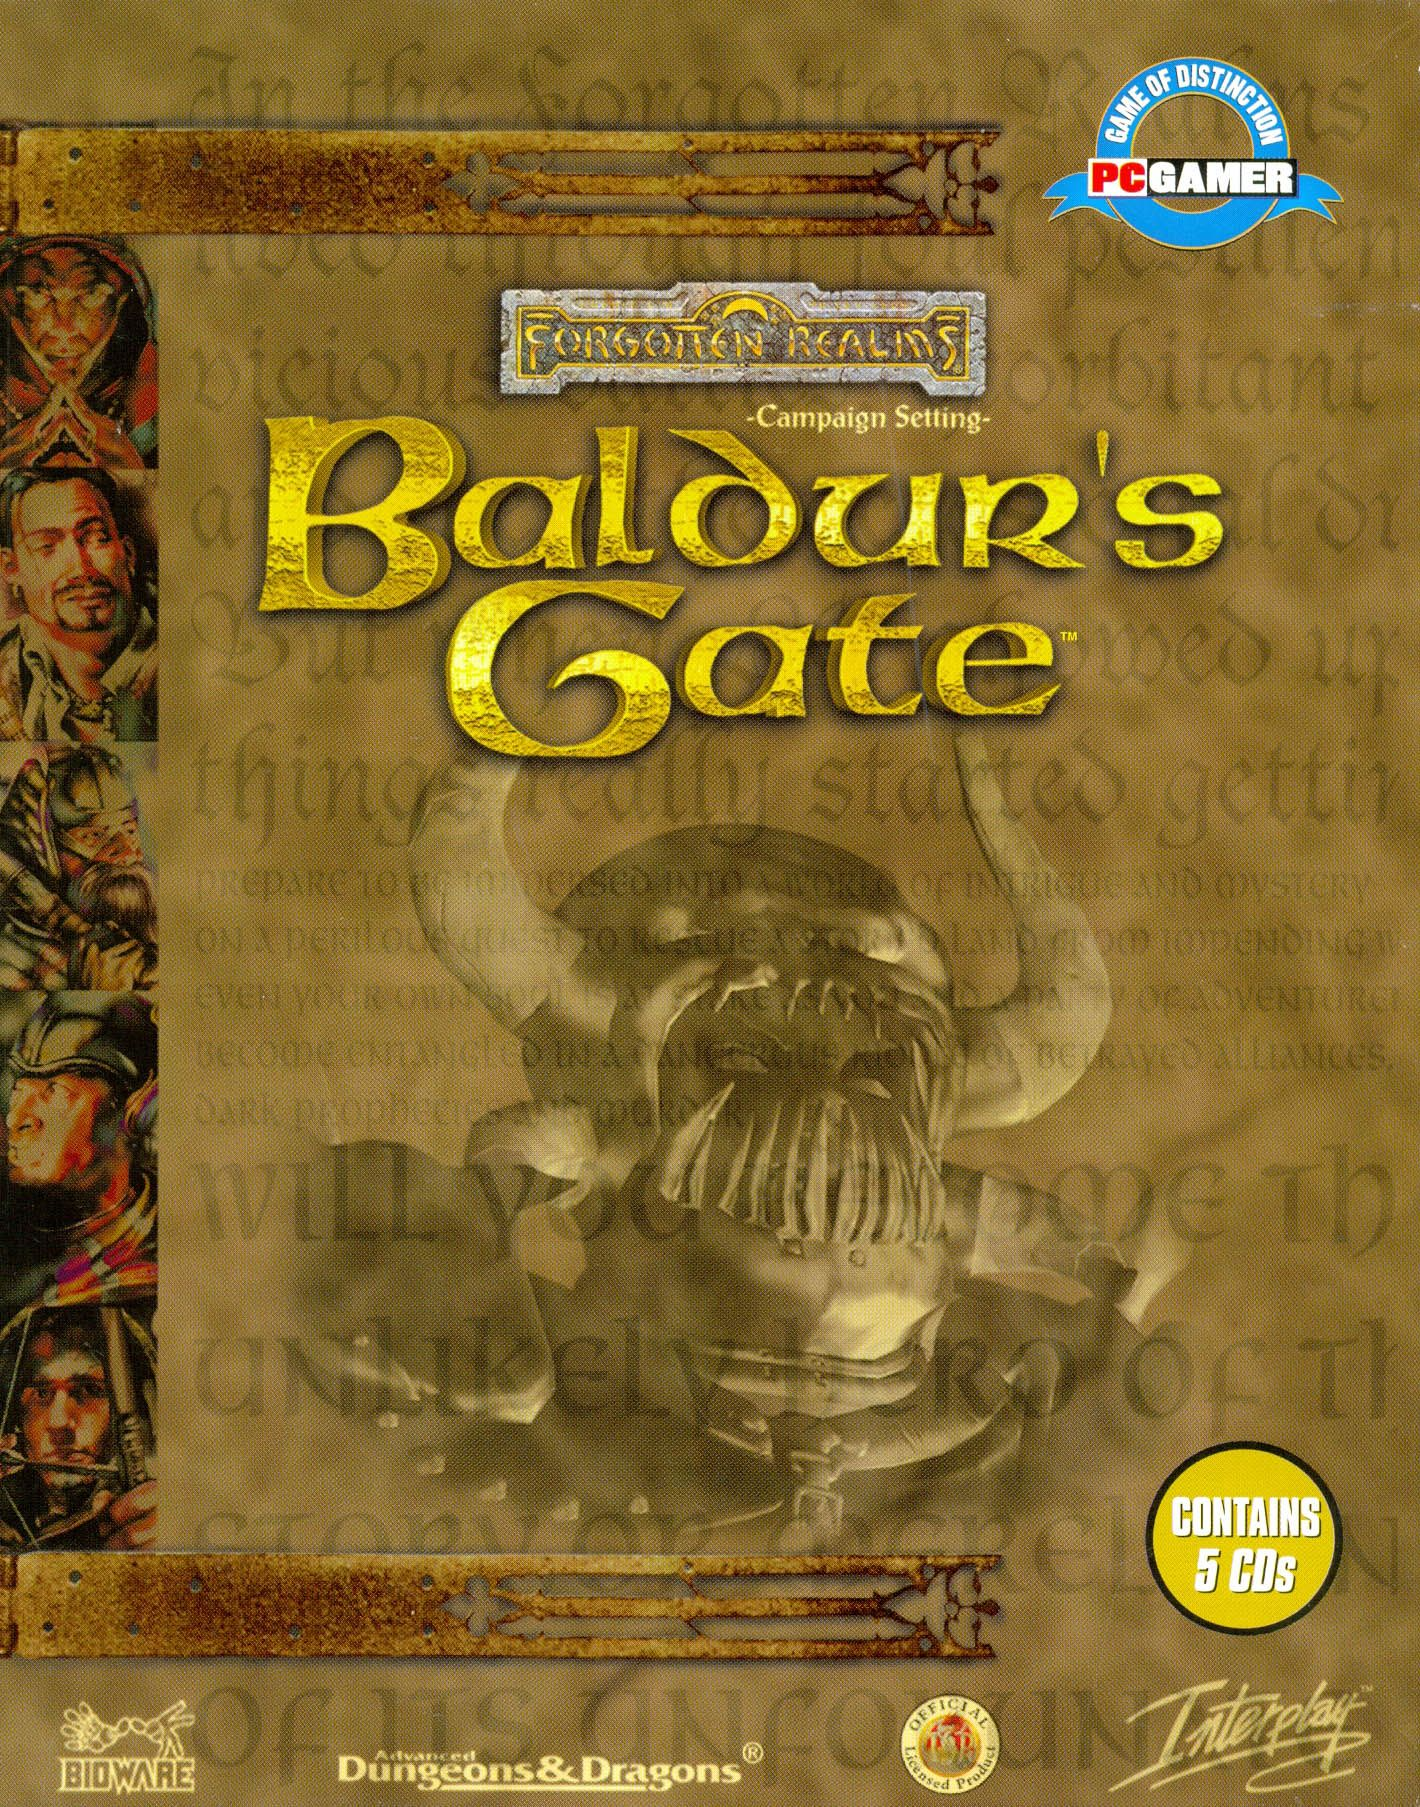 Baldur's Gate Baldur's gate, Dungeons and dragons, Video